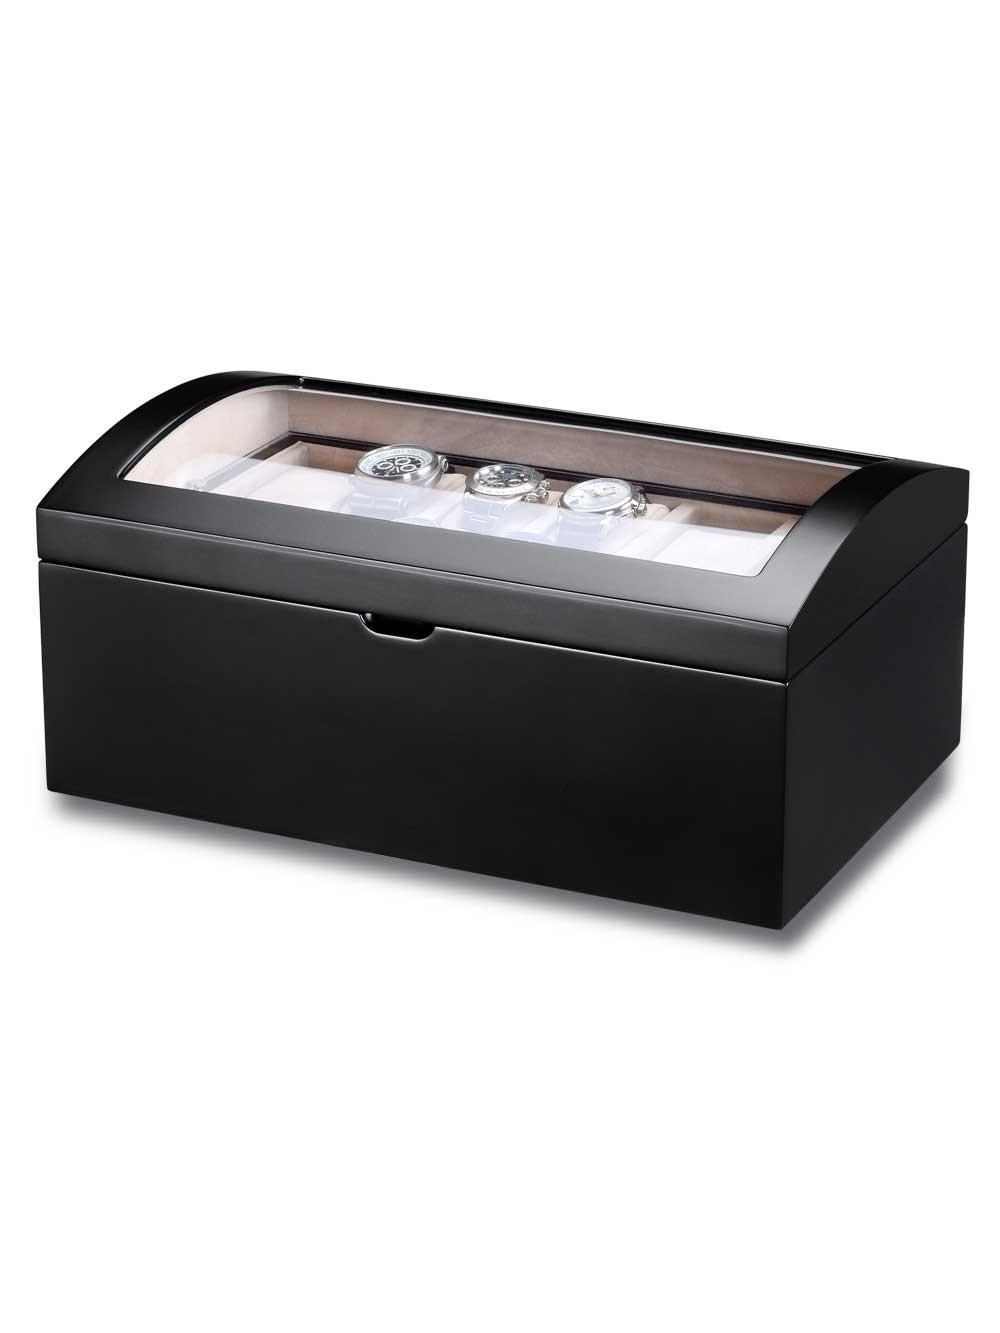 cutie ceasuri rothenschild exclusive-line [24] rs-5038-bk